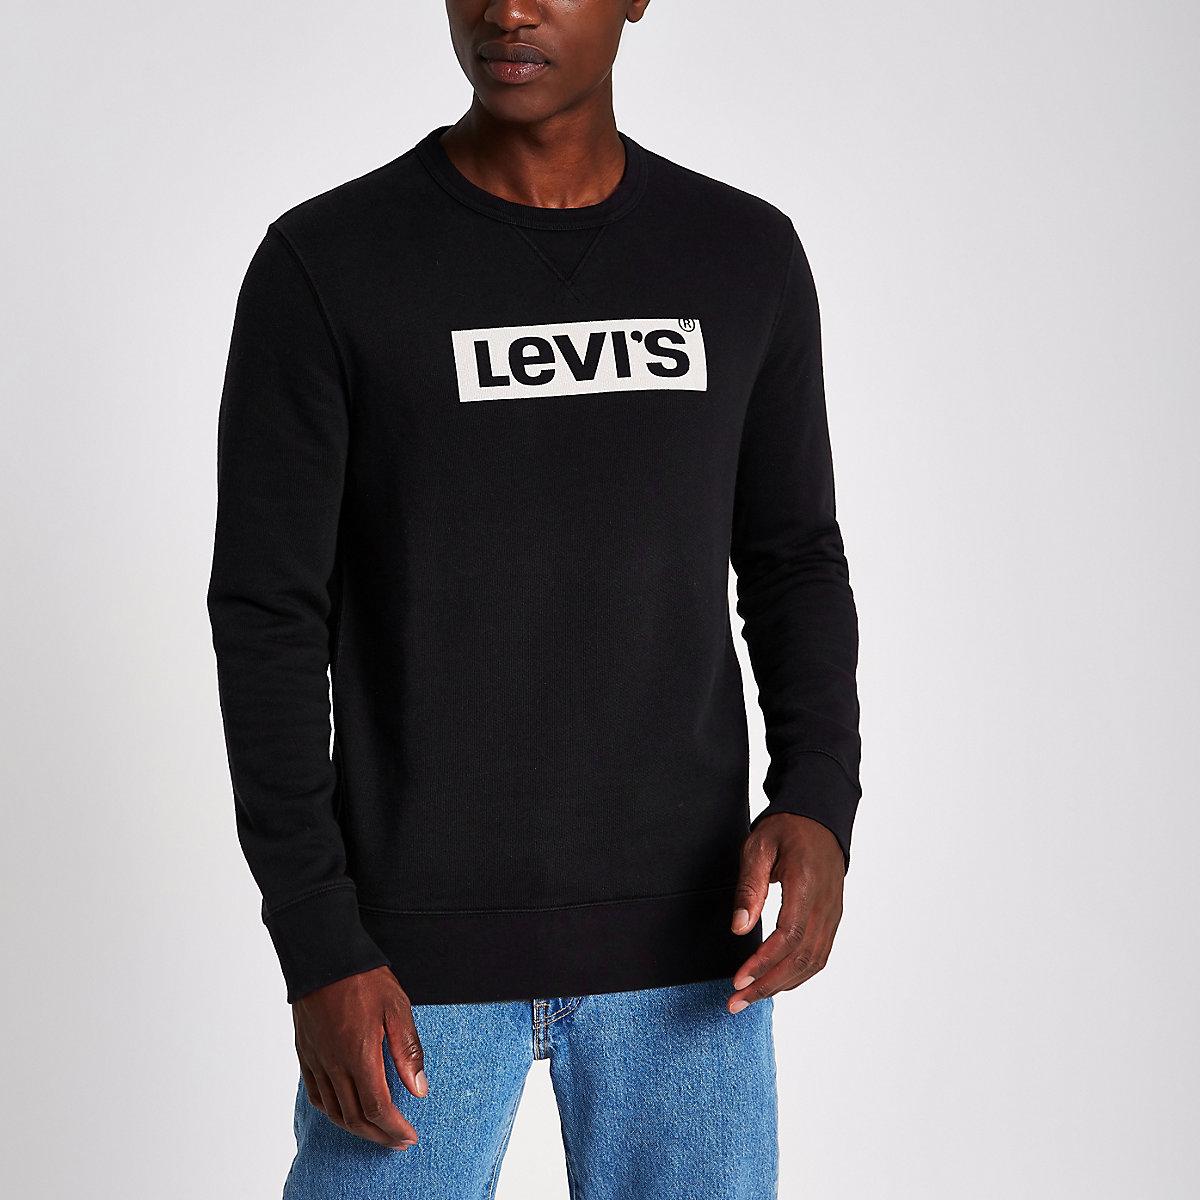 Levi's black long sleeve logo sweatshirt